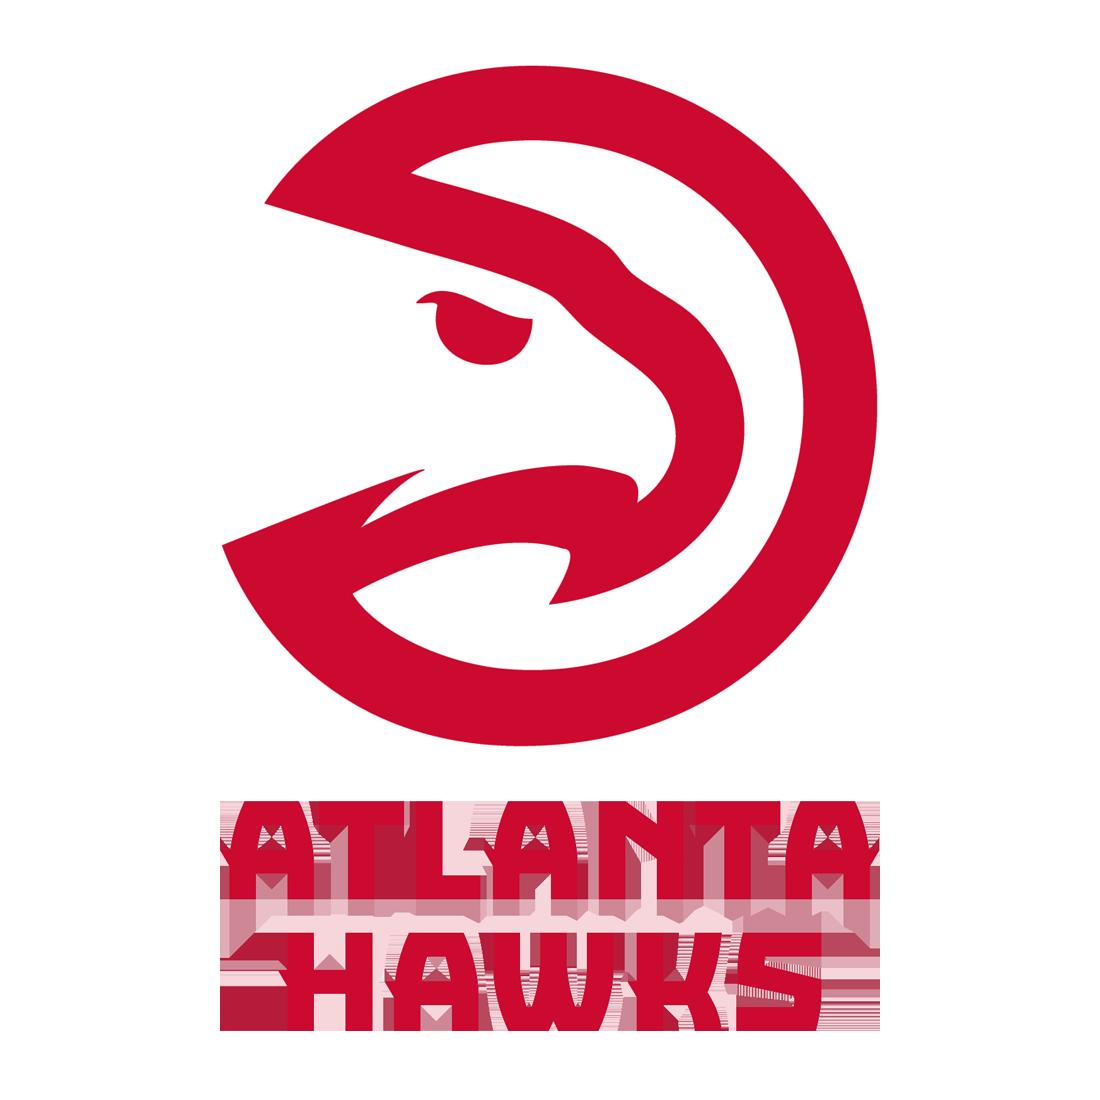 Atlanta hawks logo png transparent svg vector freebie supply atlanta hawks logo pacman with text buycottarizona